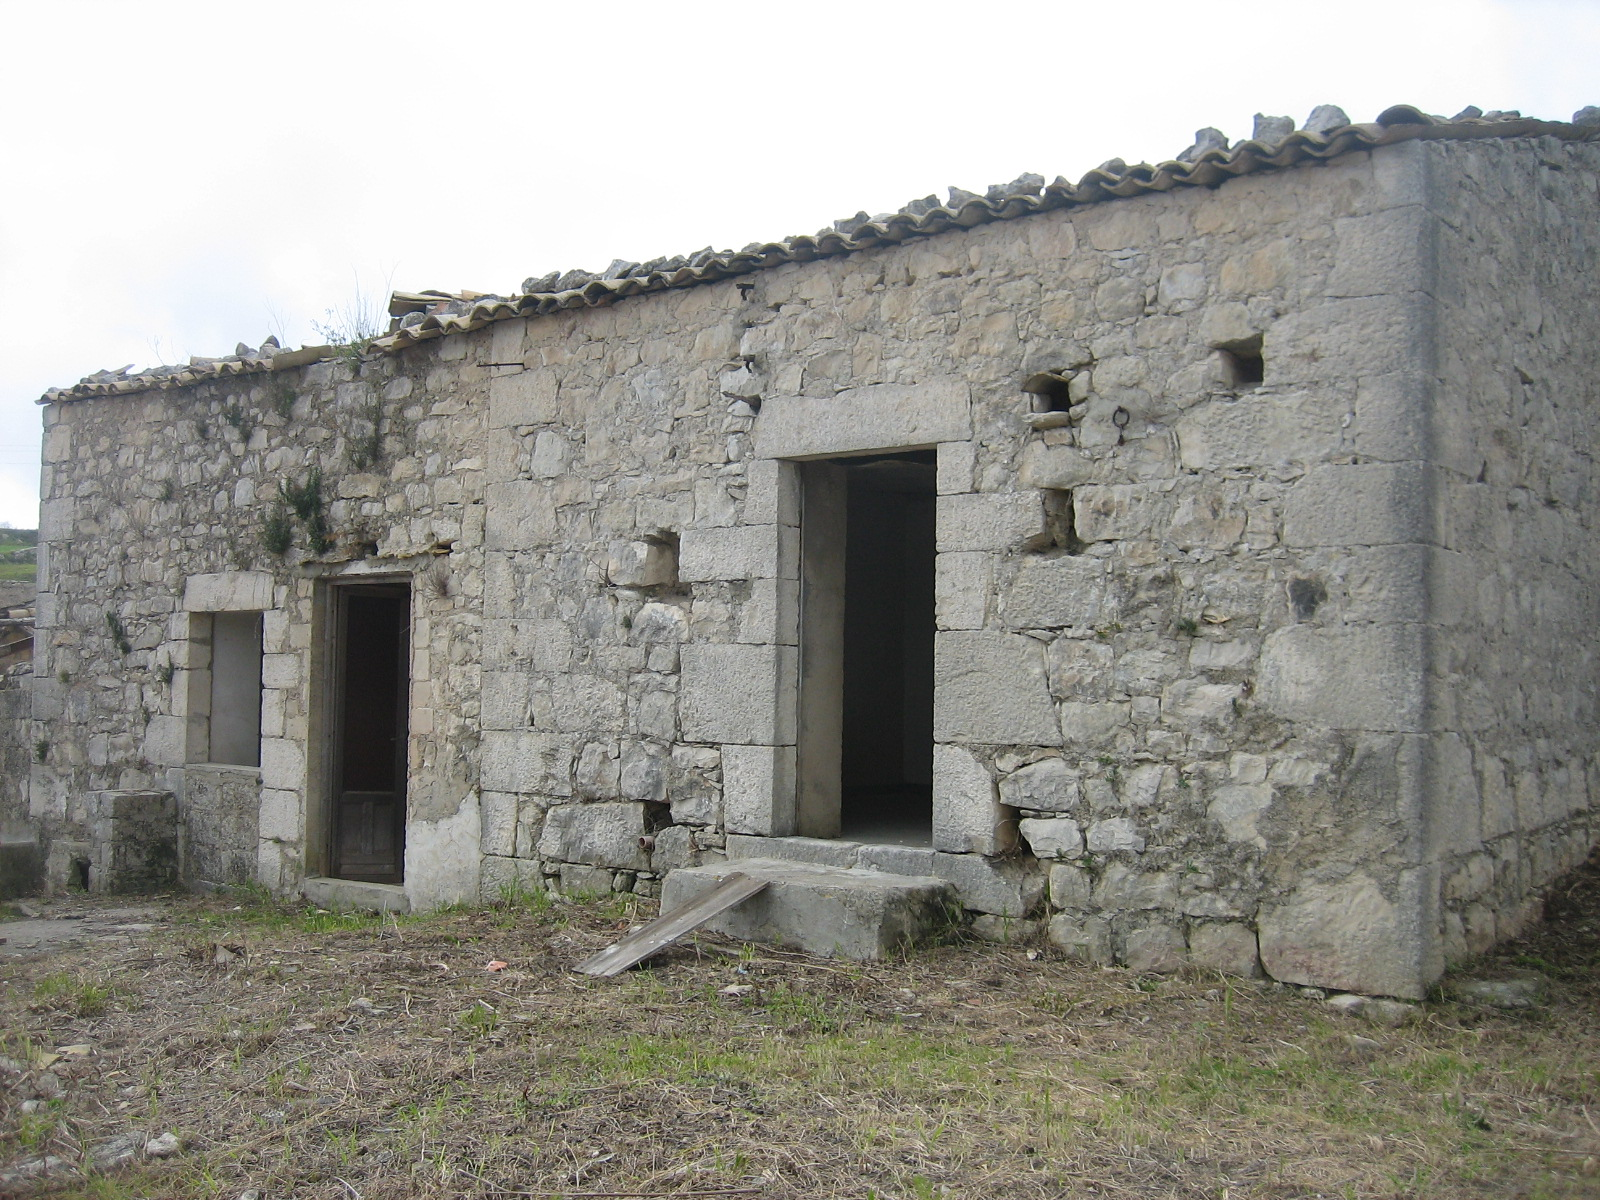 Vente maison de campagne ragusa ragusa italie - Maison provinciale rustique campagne svetti ...